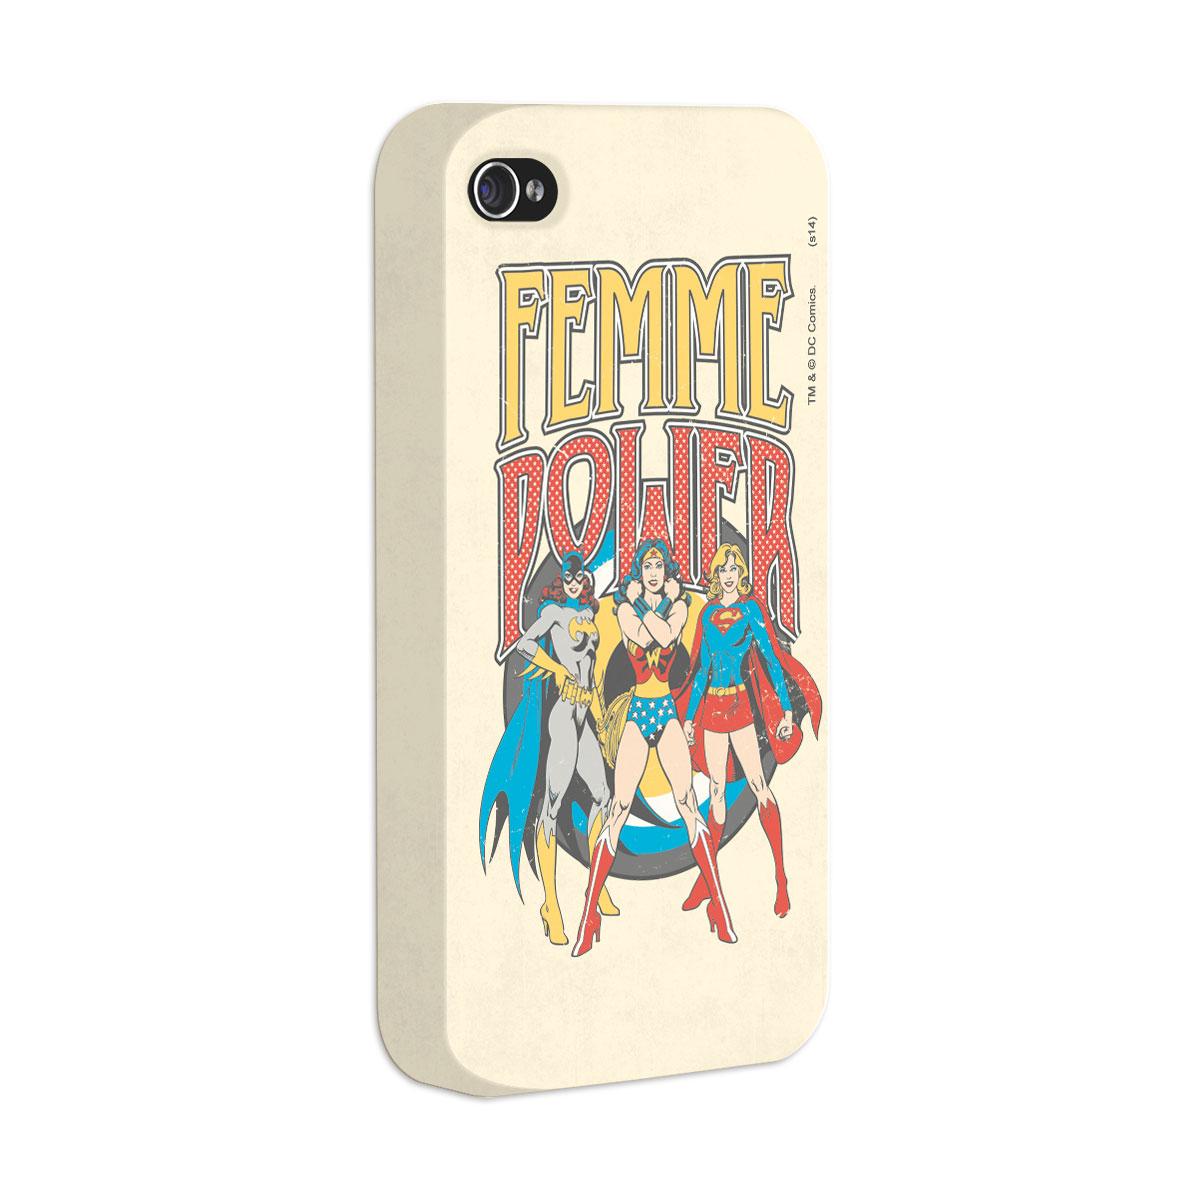 Capa Para iPhone 4/4S Power Girls Femme Power